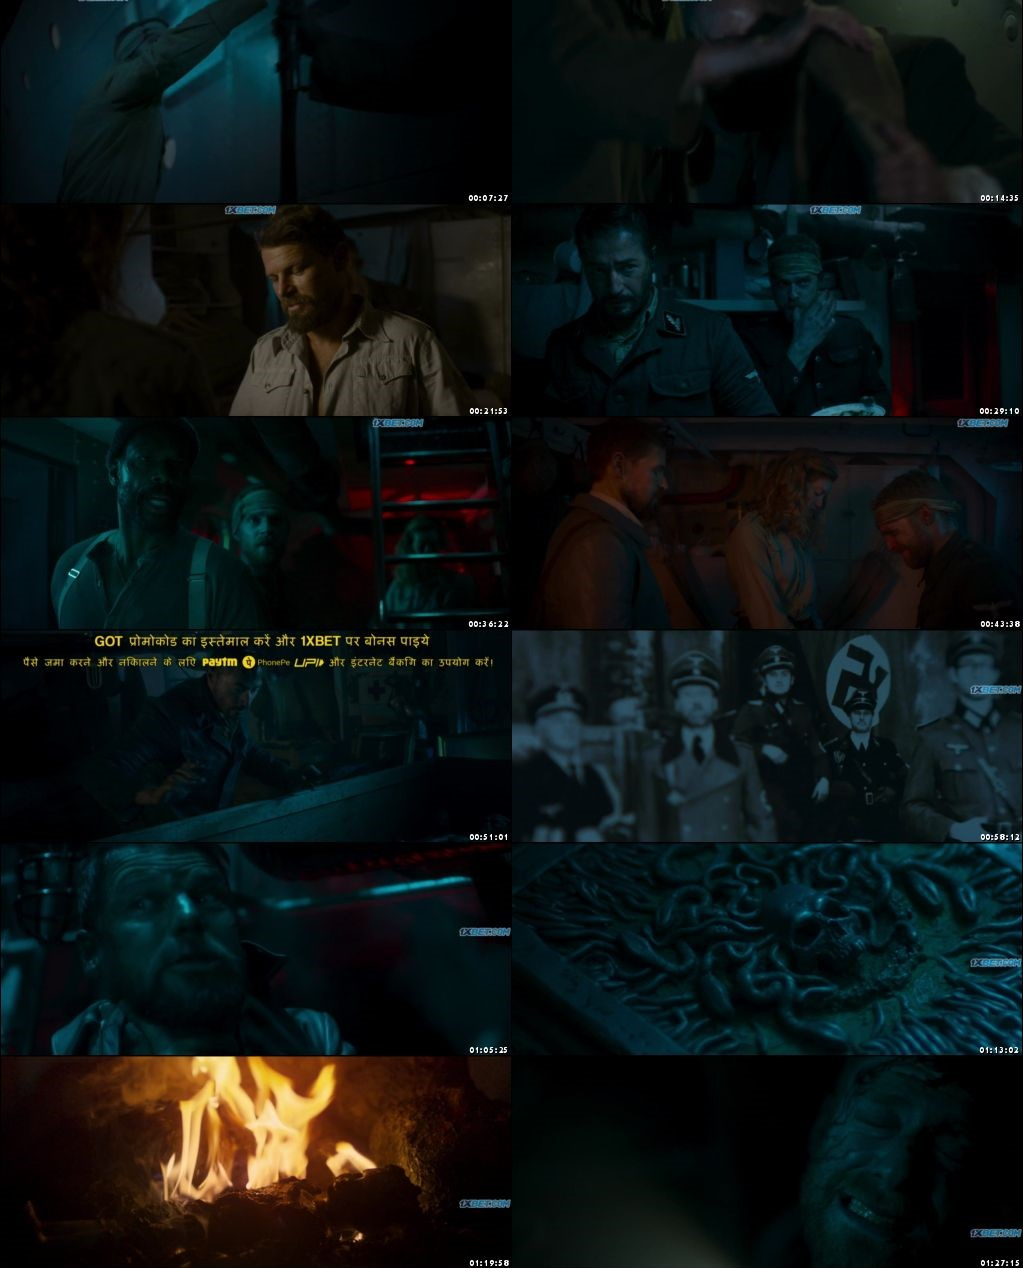 Blood Vessel 2019 Full Movie Online Watch